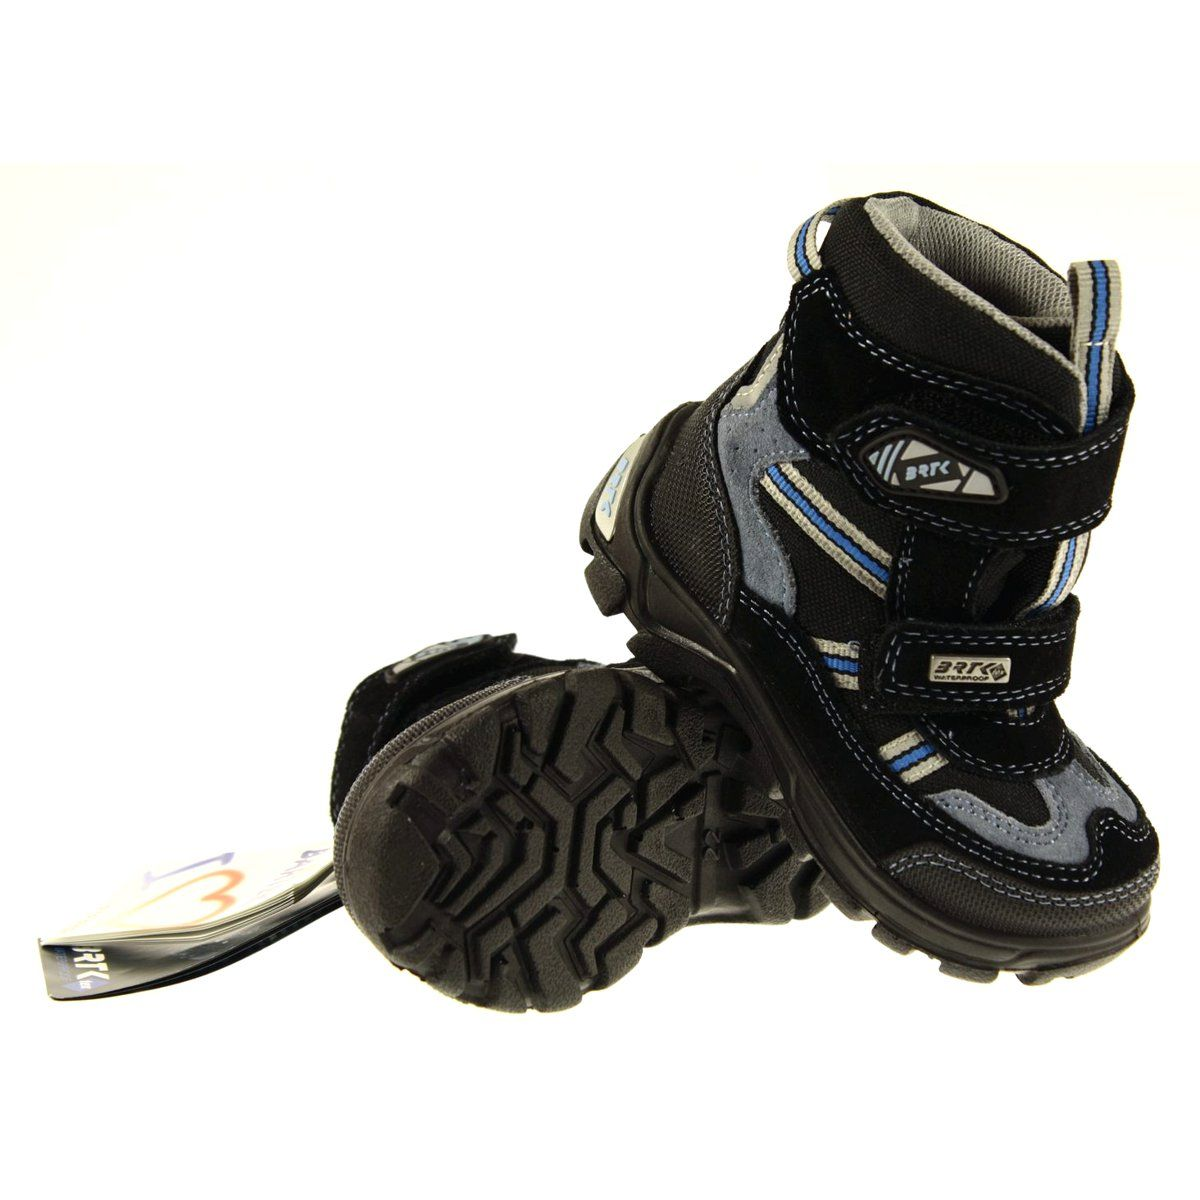 Trzewiki Chlopiece Z Membrana Bartek 31931 Szare Niebieskie Czarne Boots Winter Boot Shoes